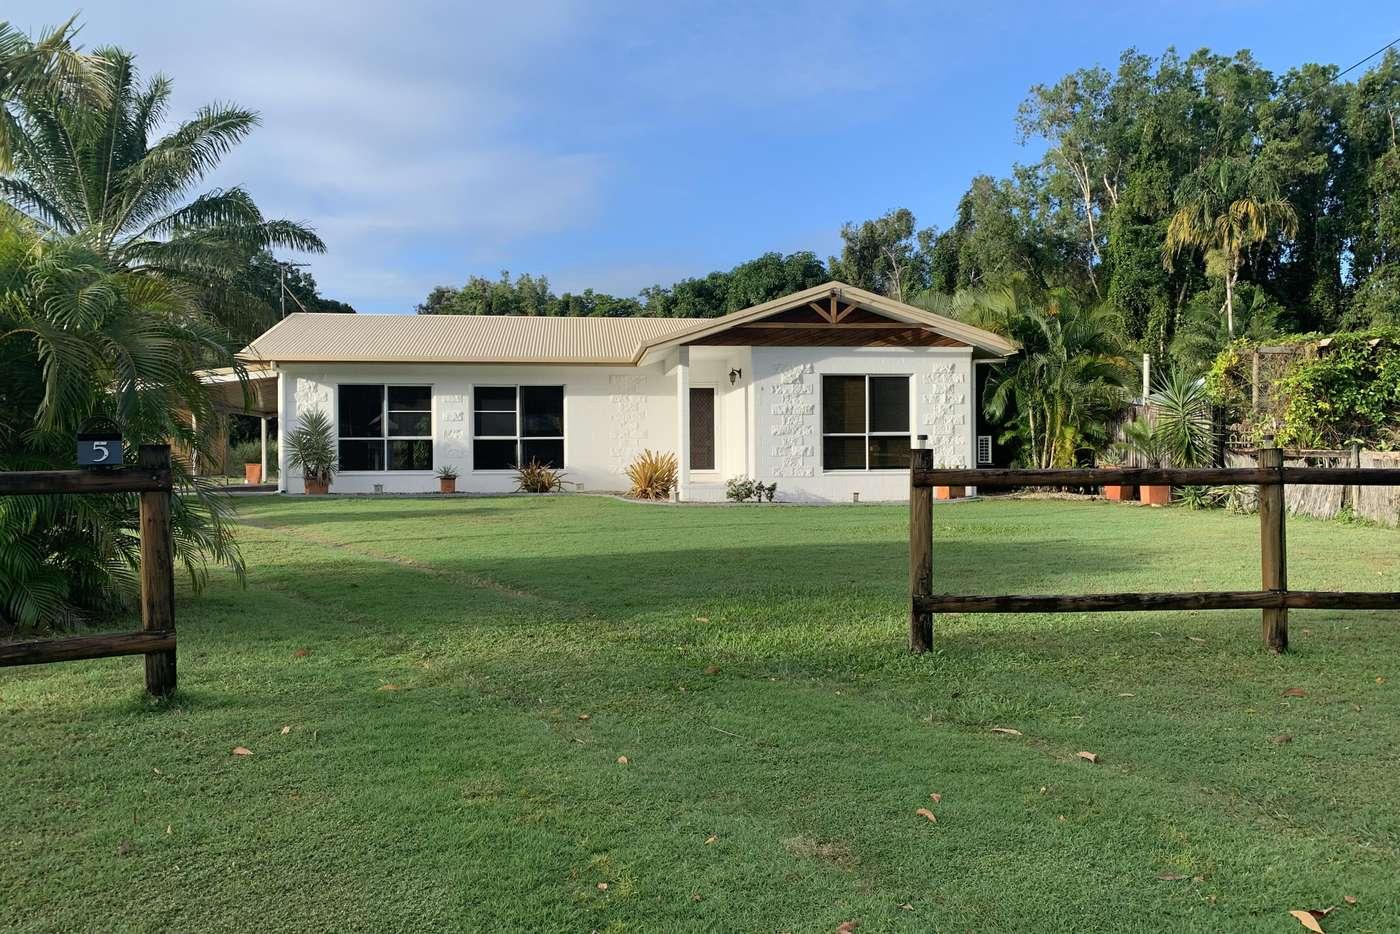 Main view of Homely house listing, 5 Jirimandi Close, Wonga Beach QLD 4873